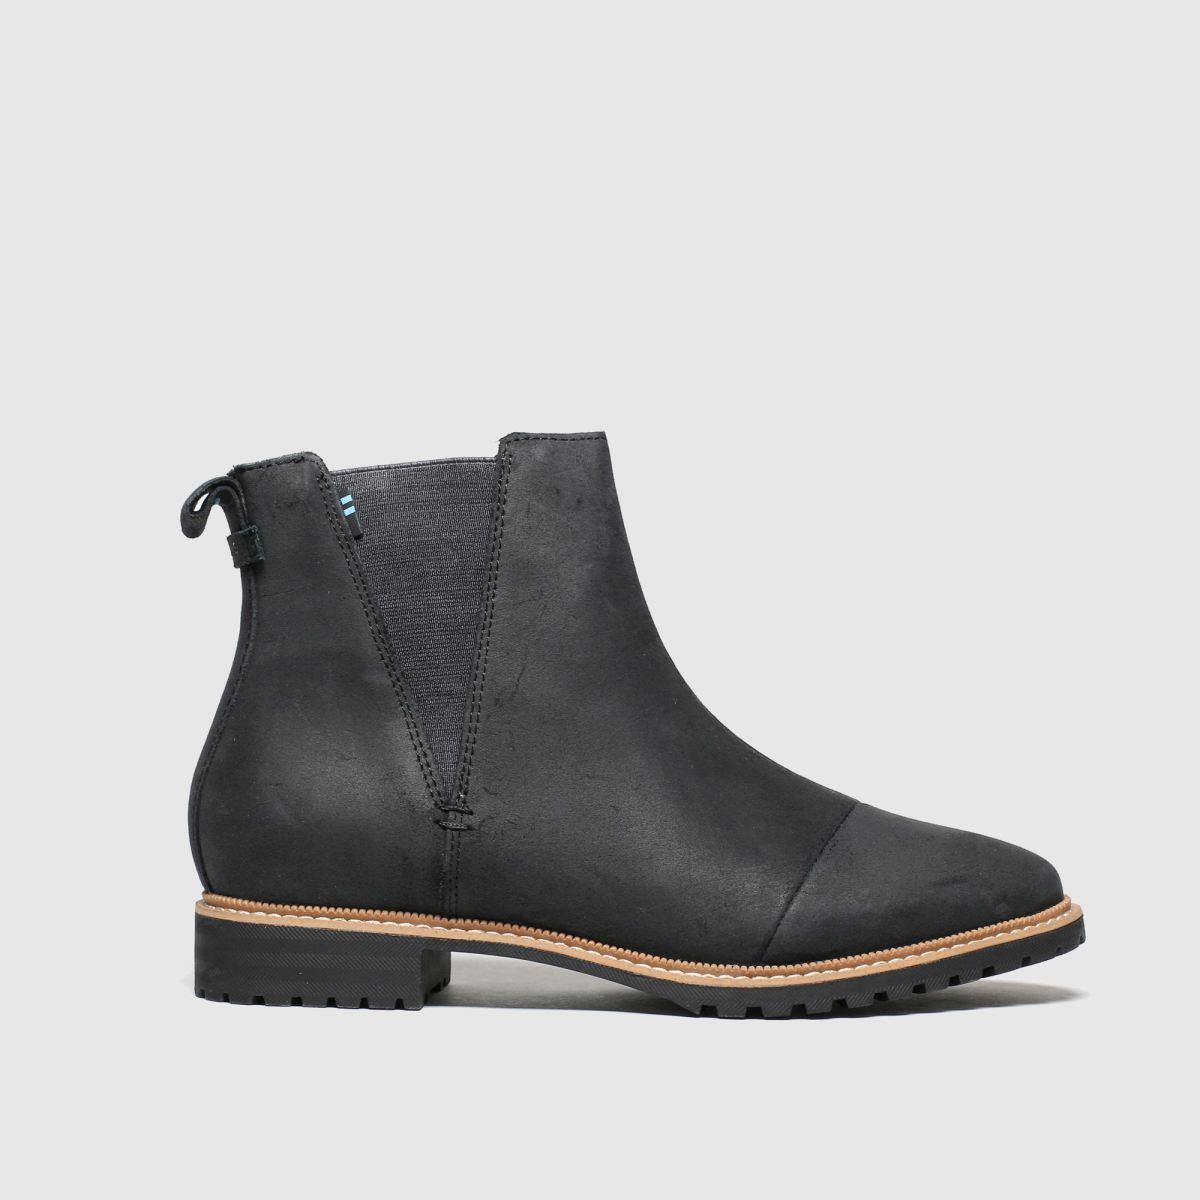 Toms Black Cleo Boots